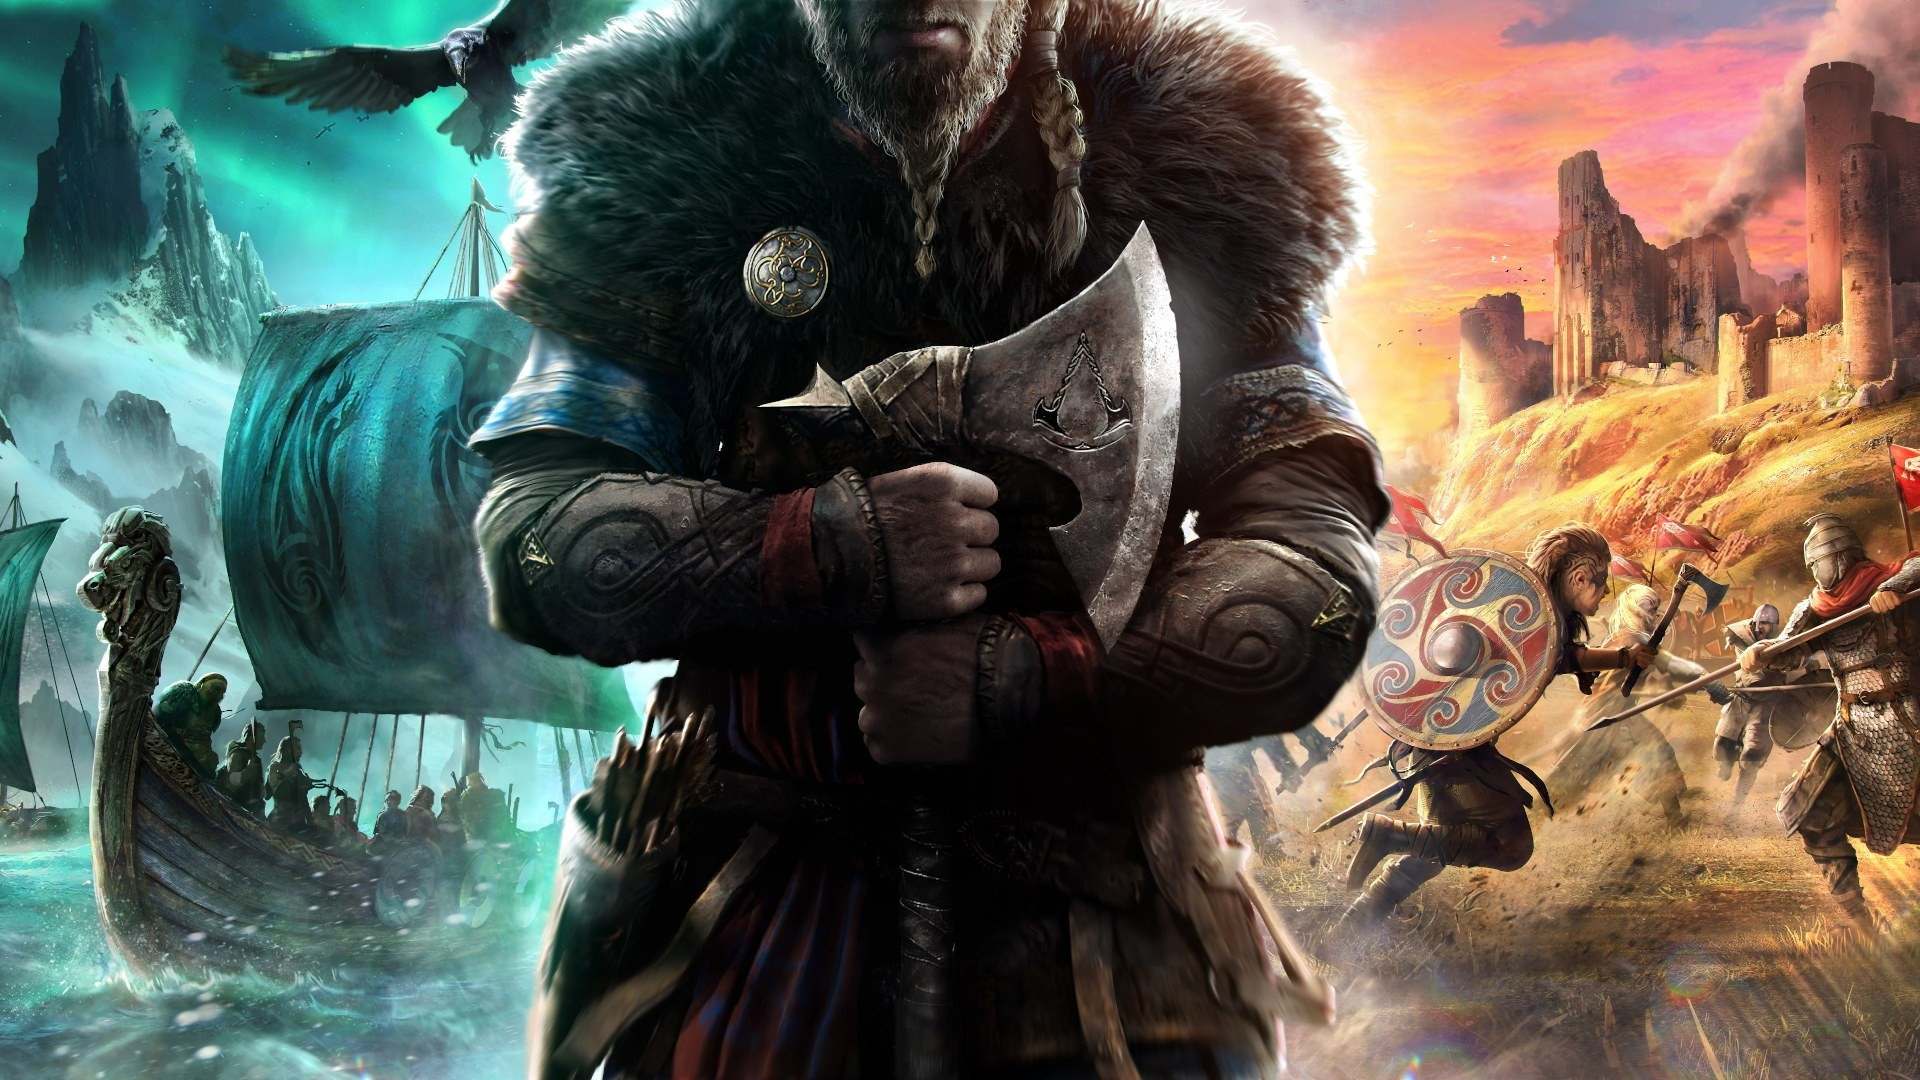 Assassins Creed Valhalla PC Wallpaper HD